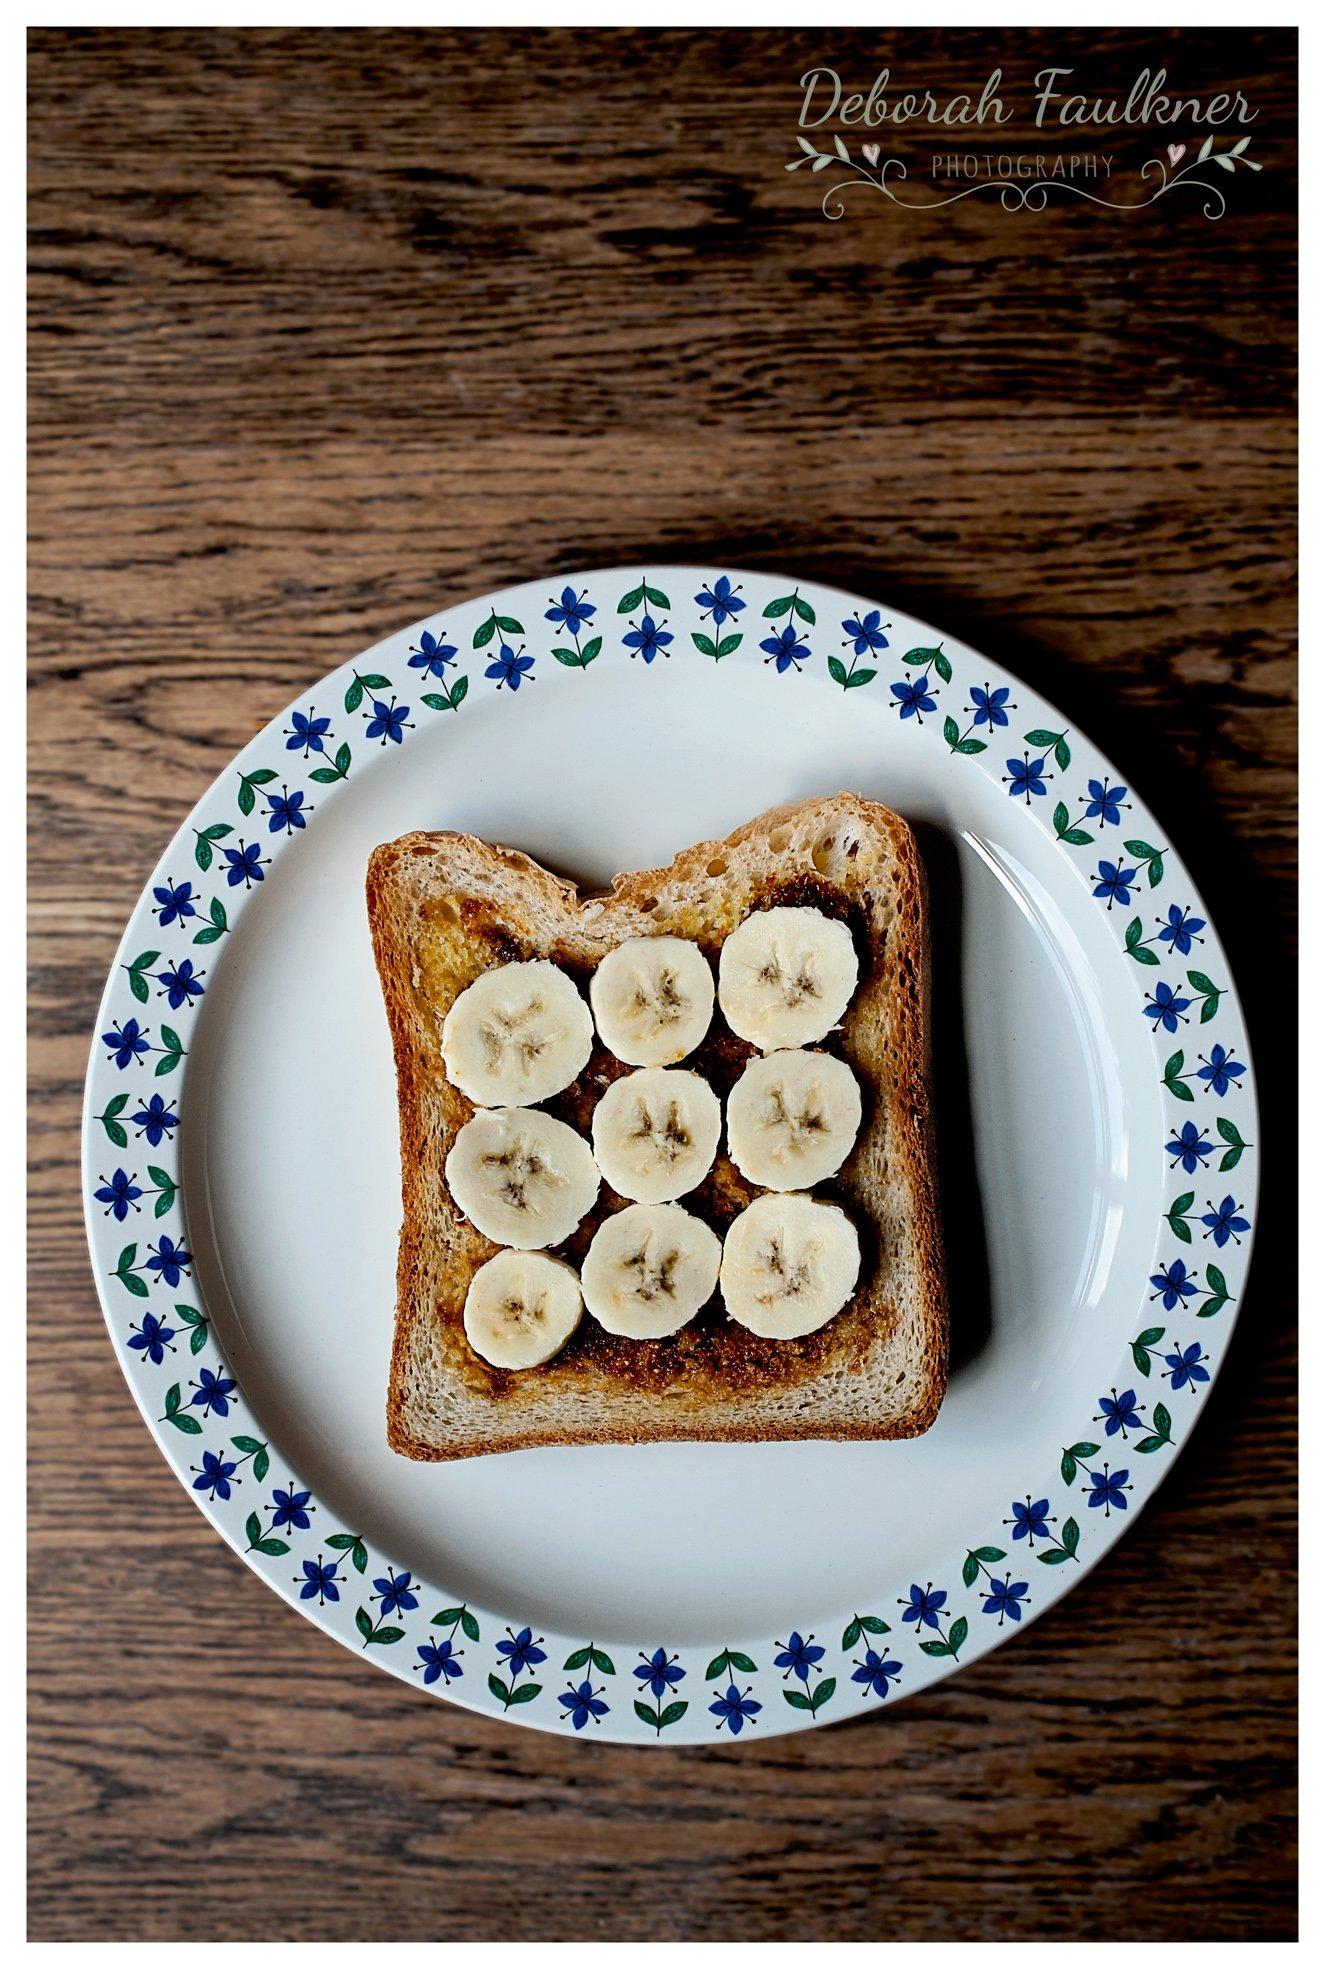 Banana and Marmite on Toast